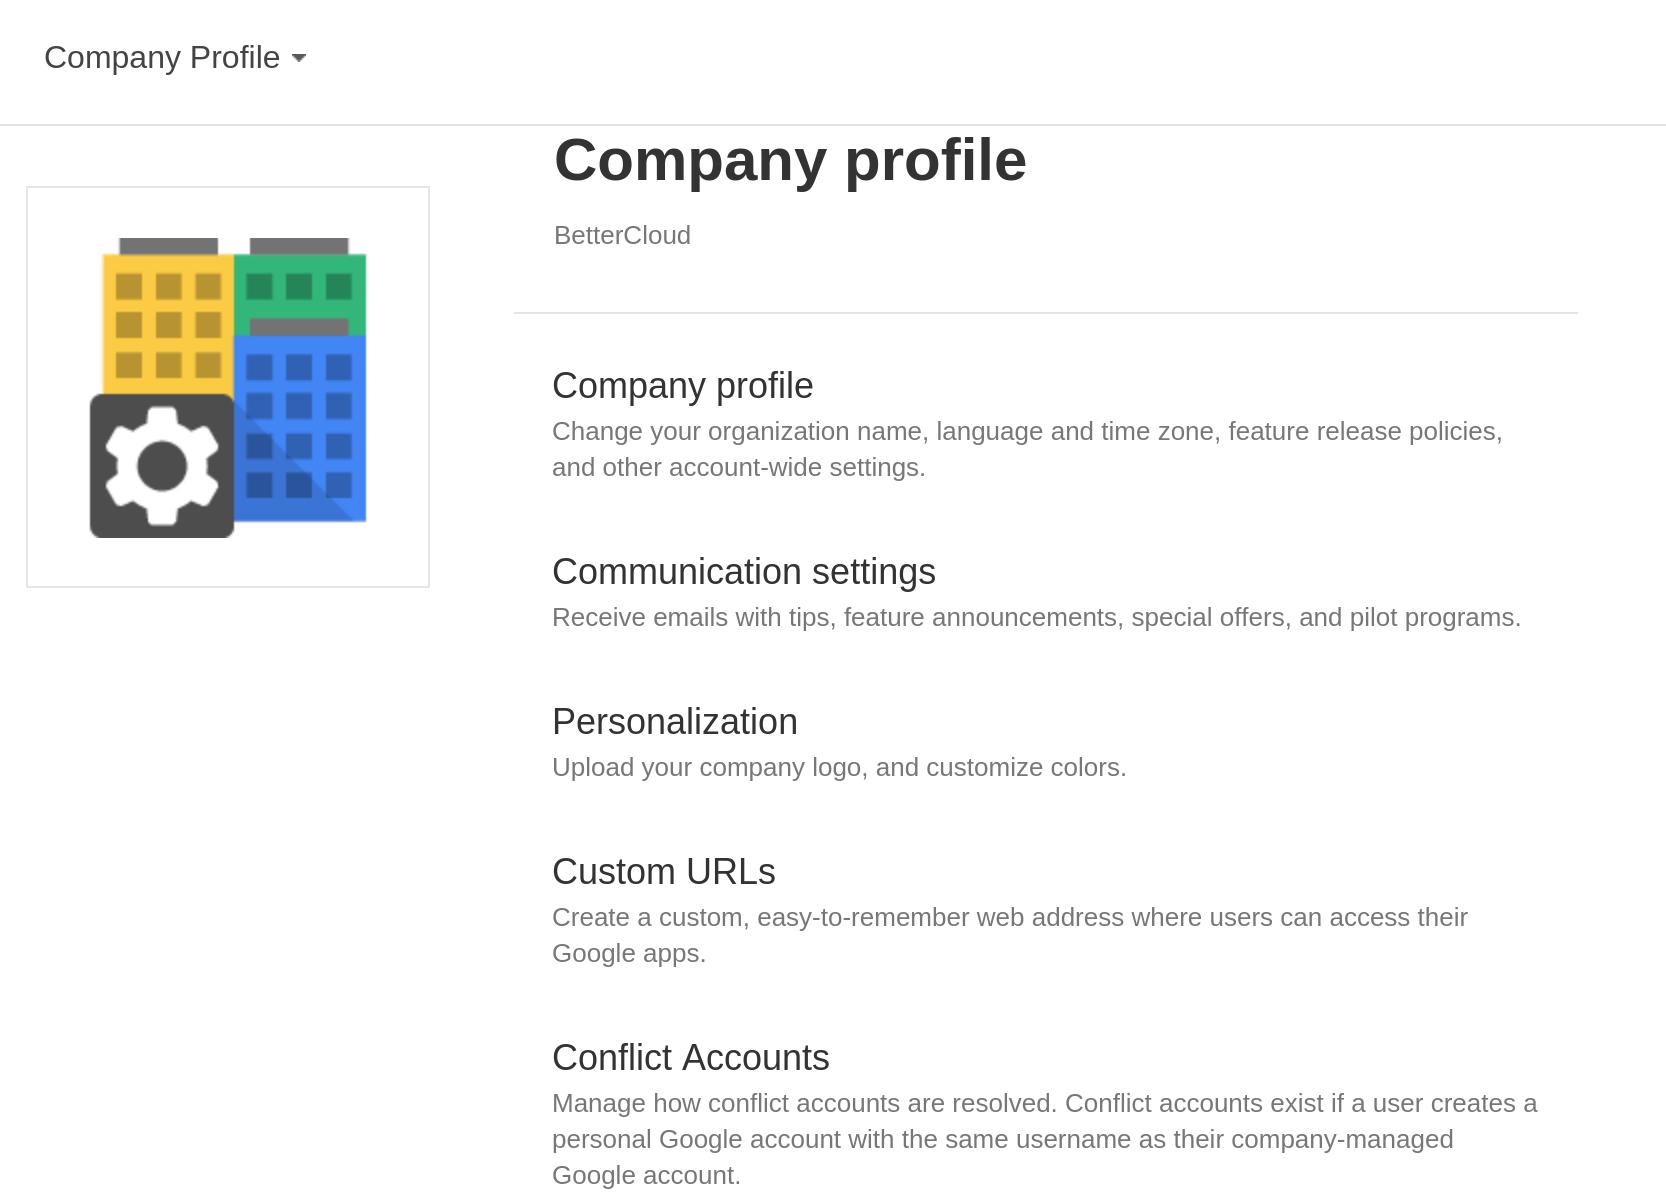 Business Profile Template Word company profile business and – Best Company Profile Format